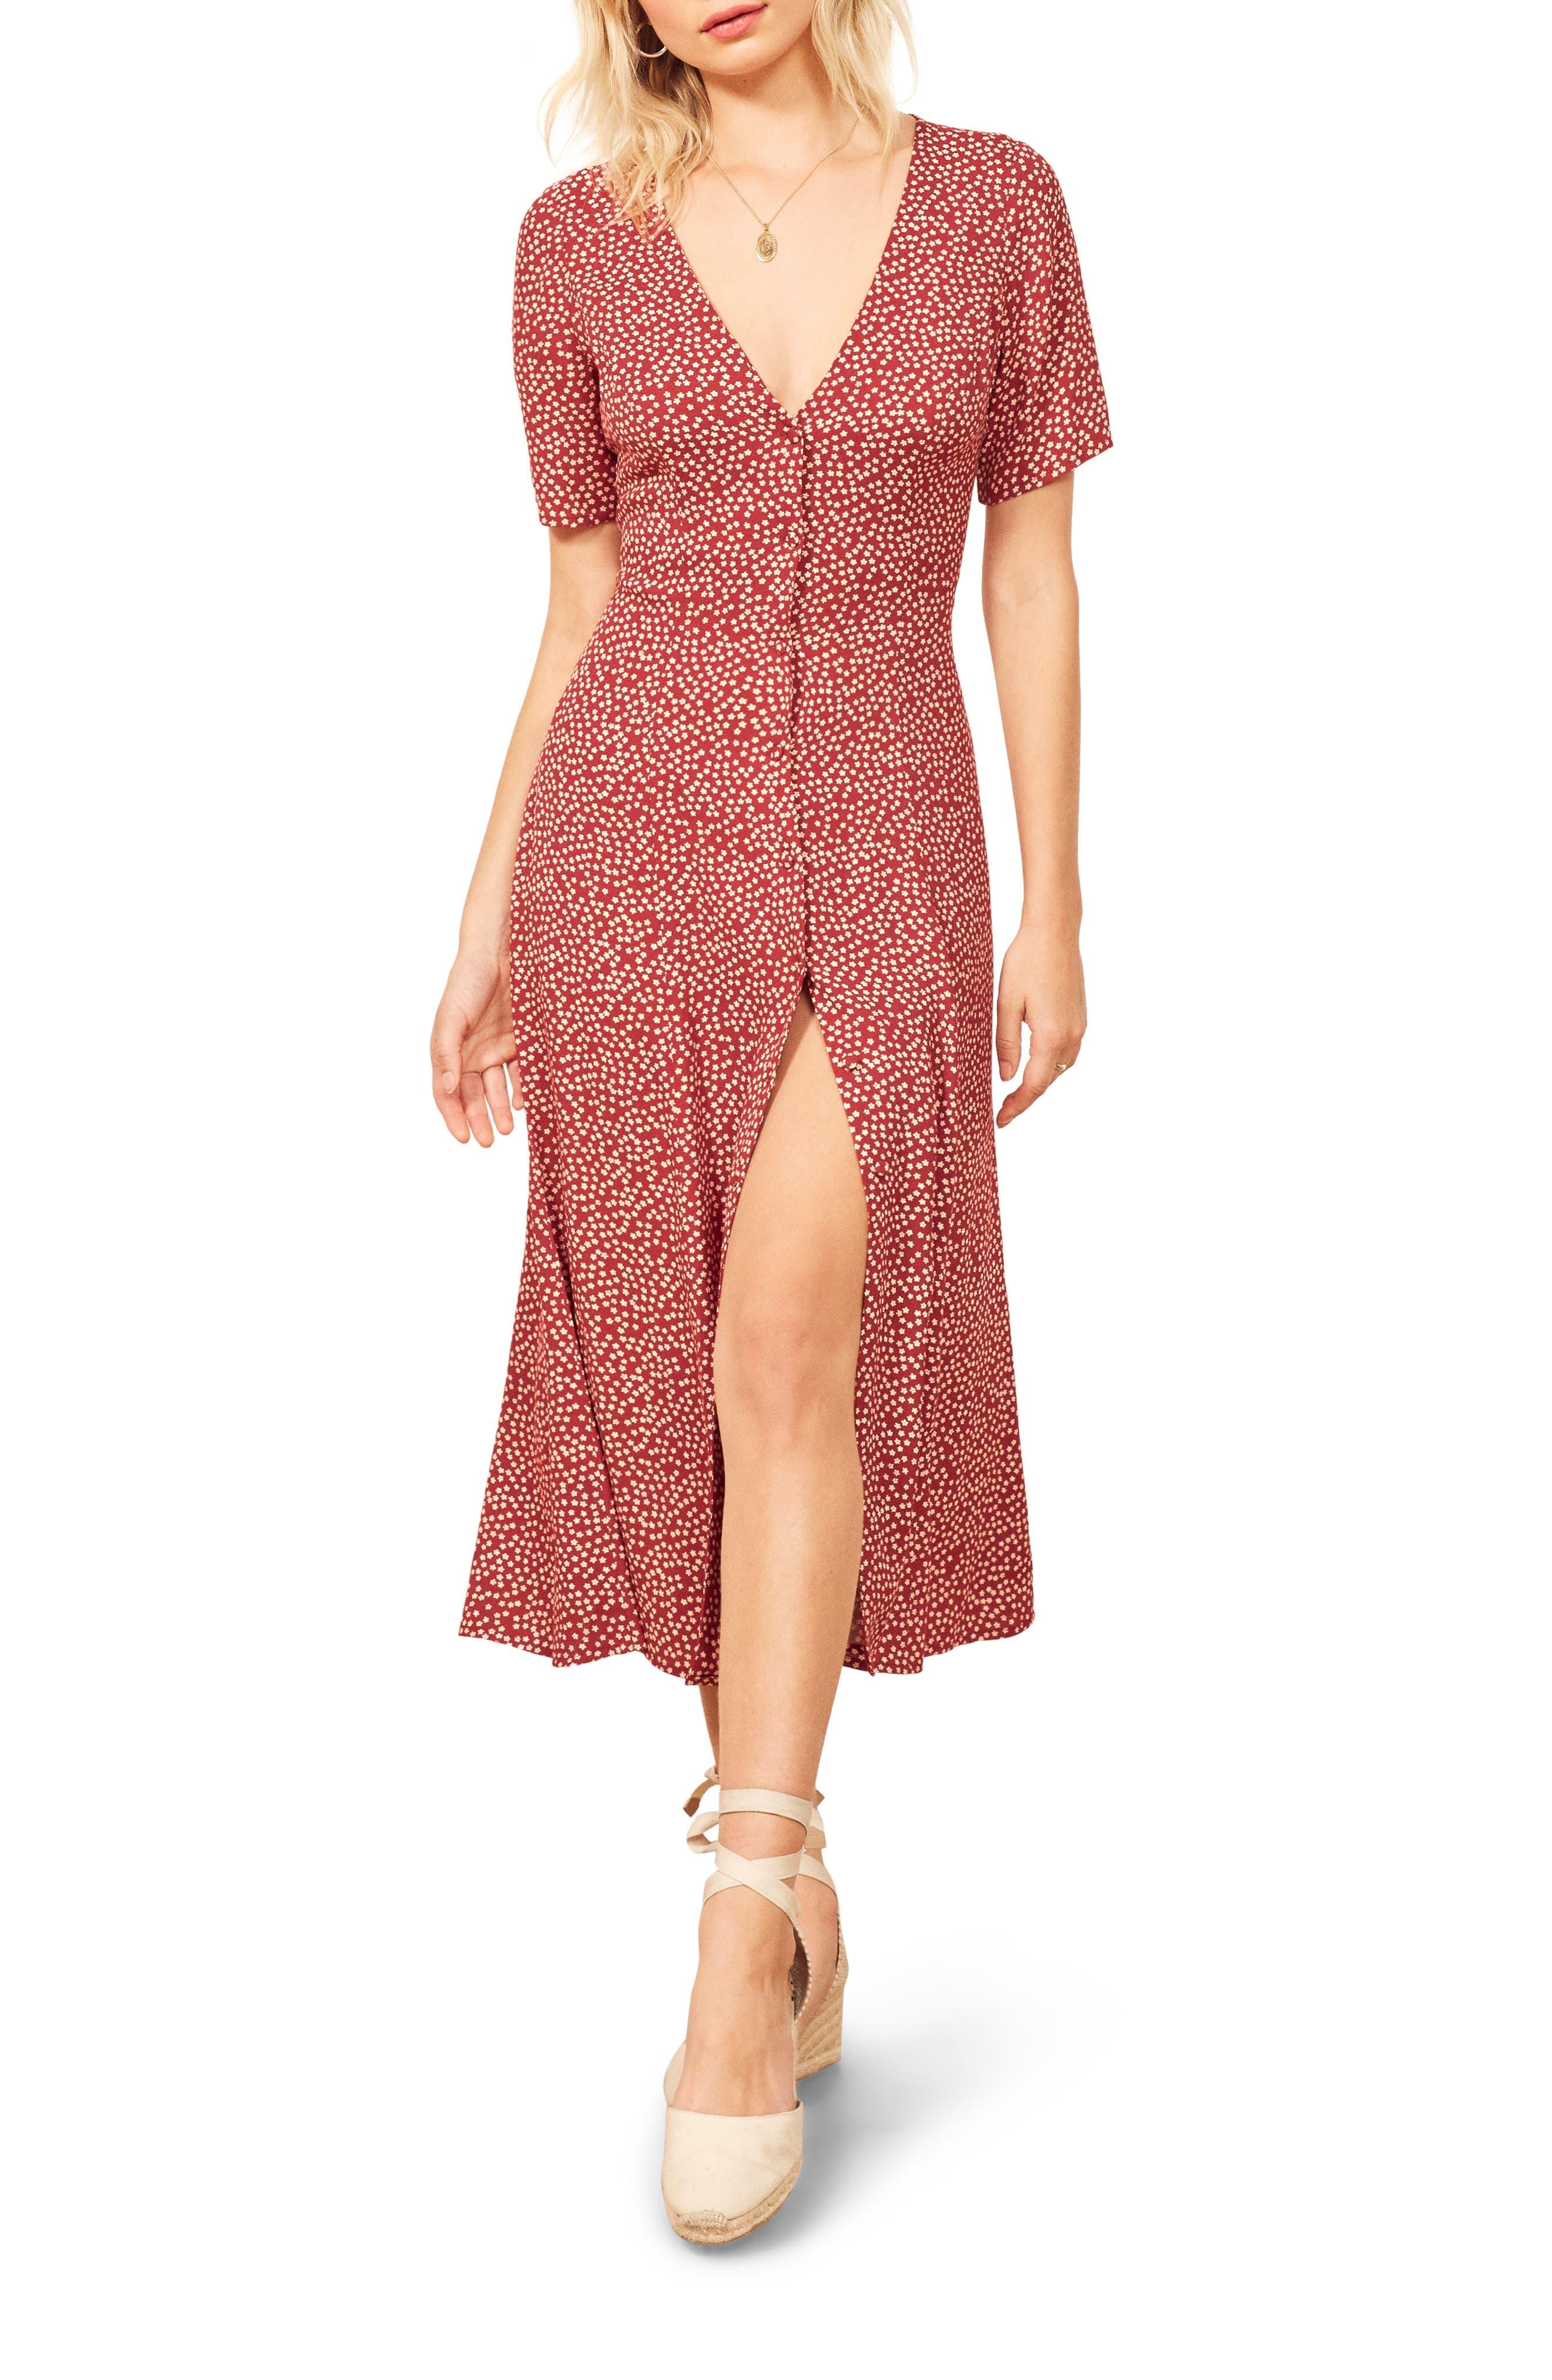 Reformation Locklin Dress, Red